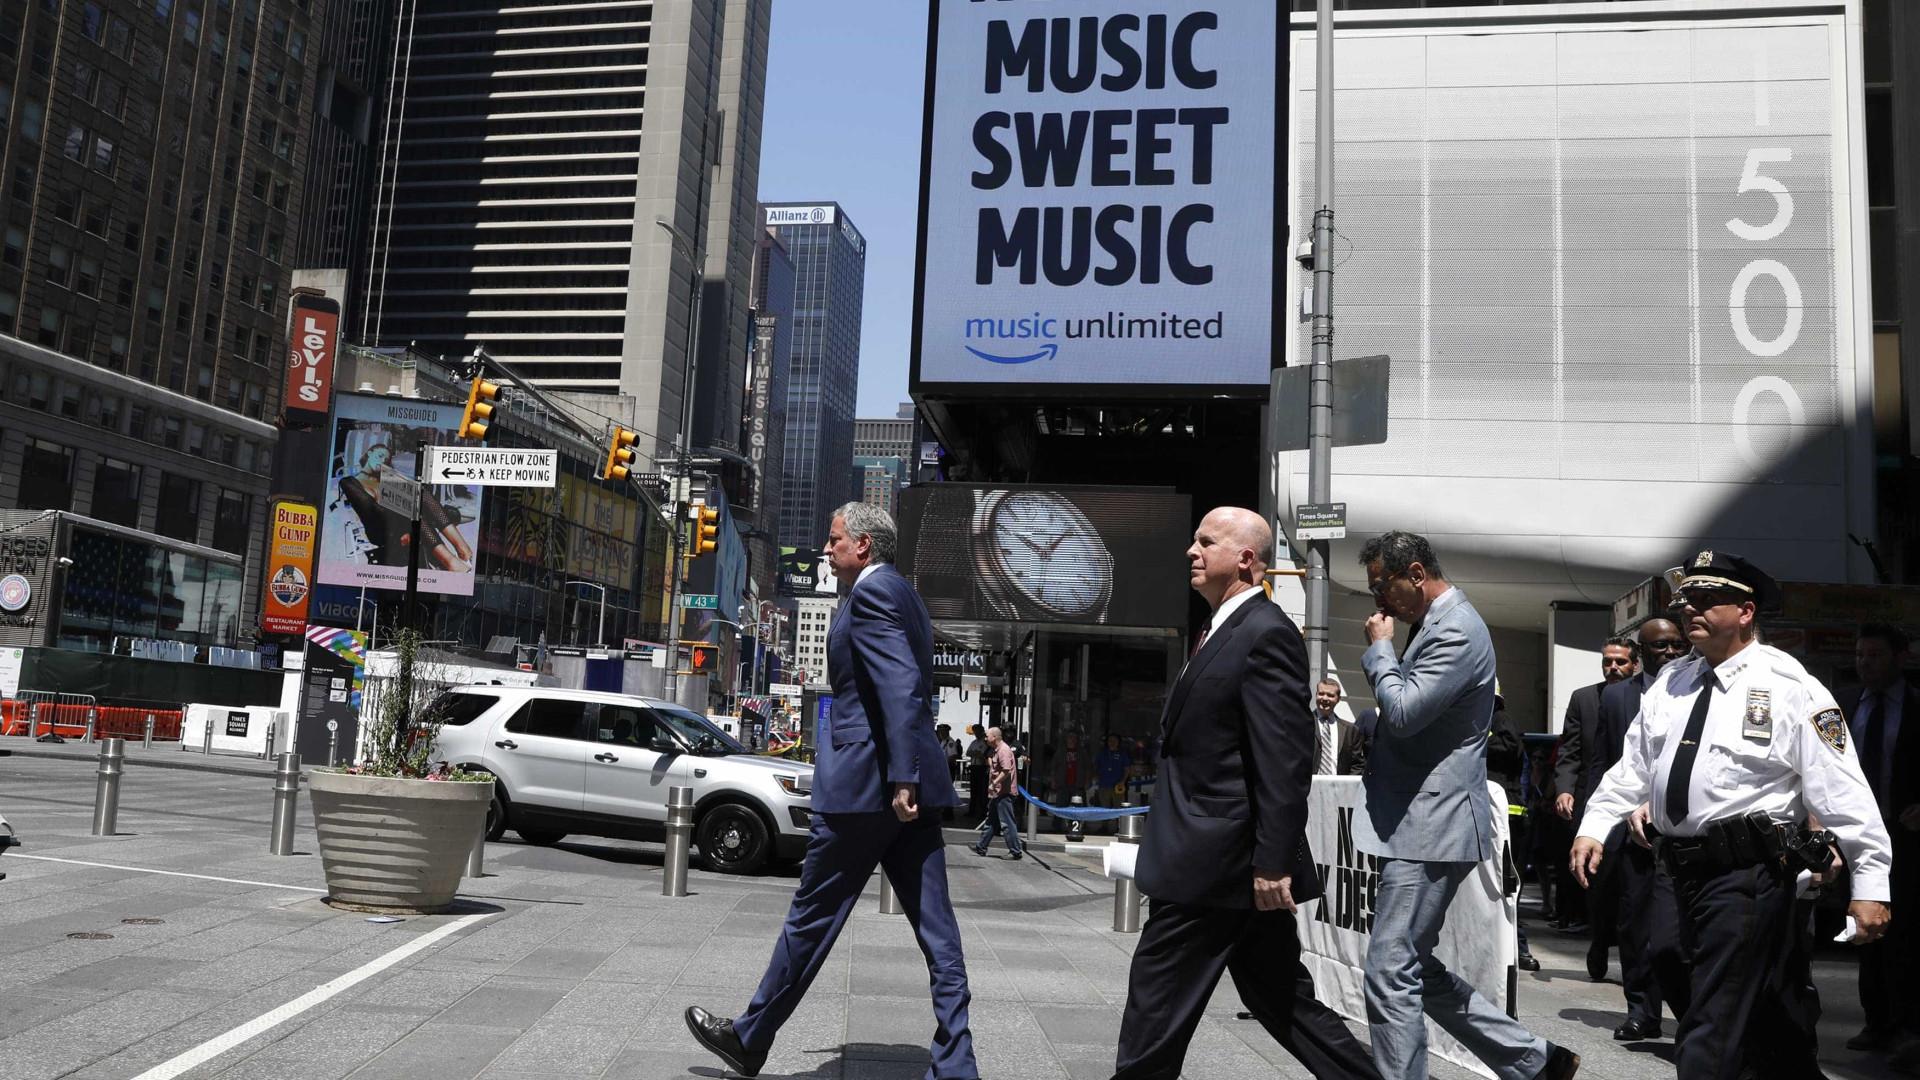 Prefeito de Nova York descarta  terrorismo na Times Square